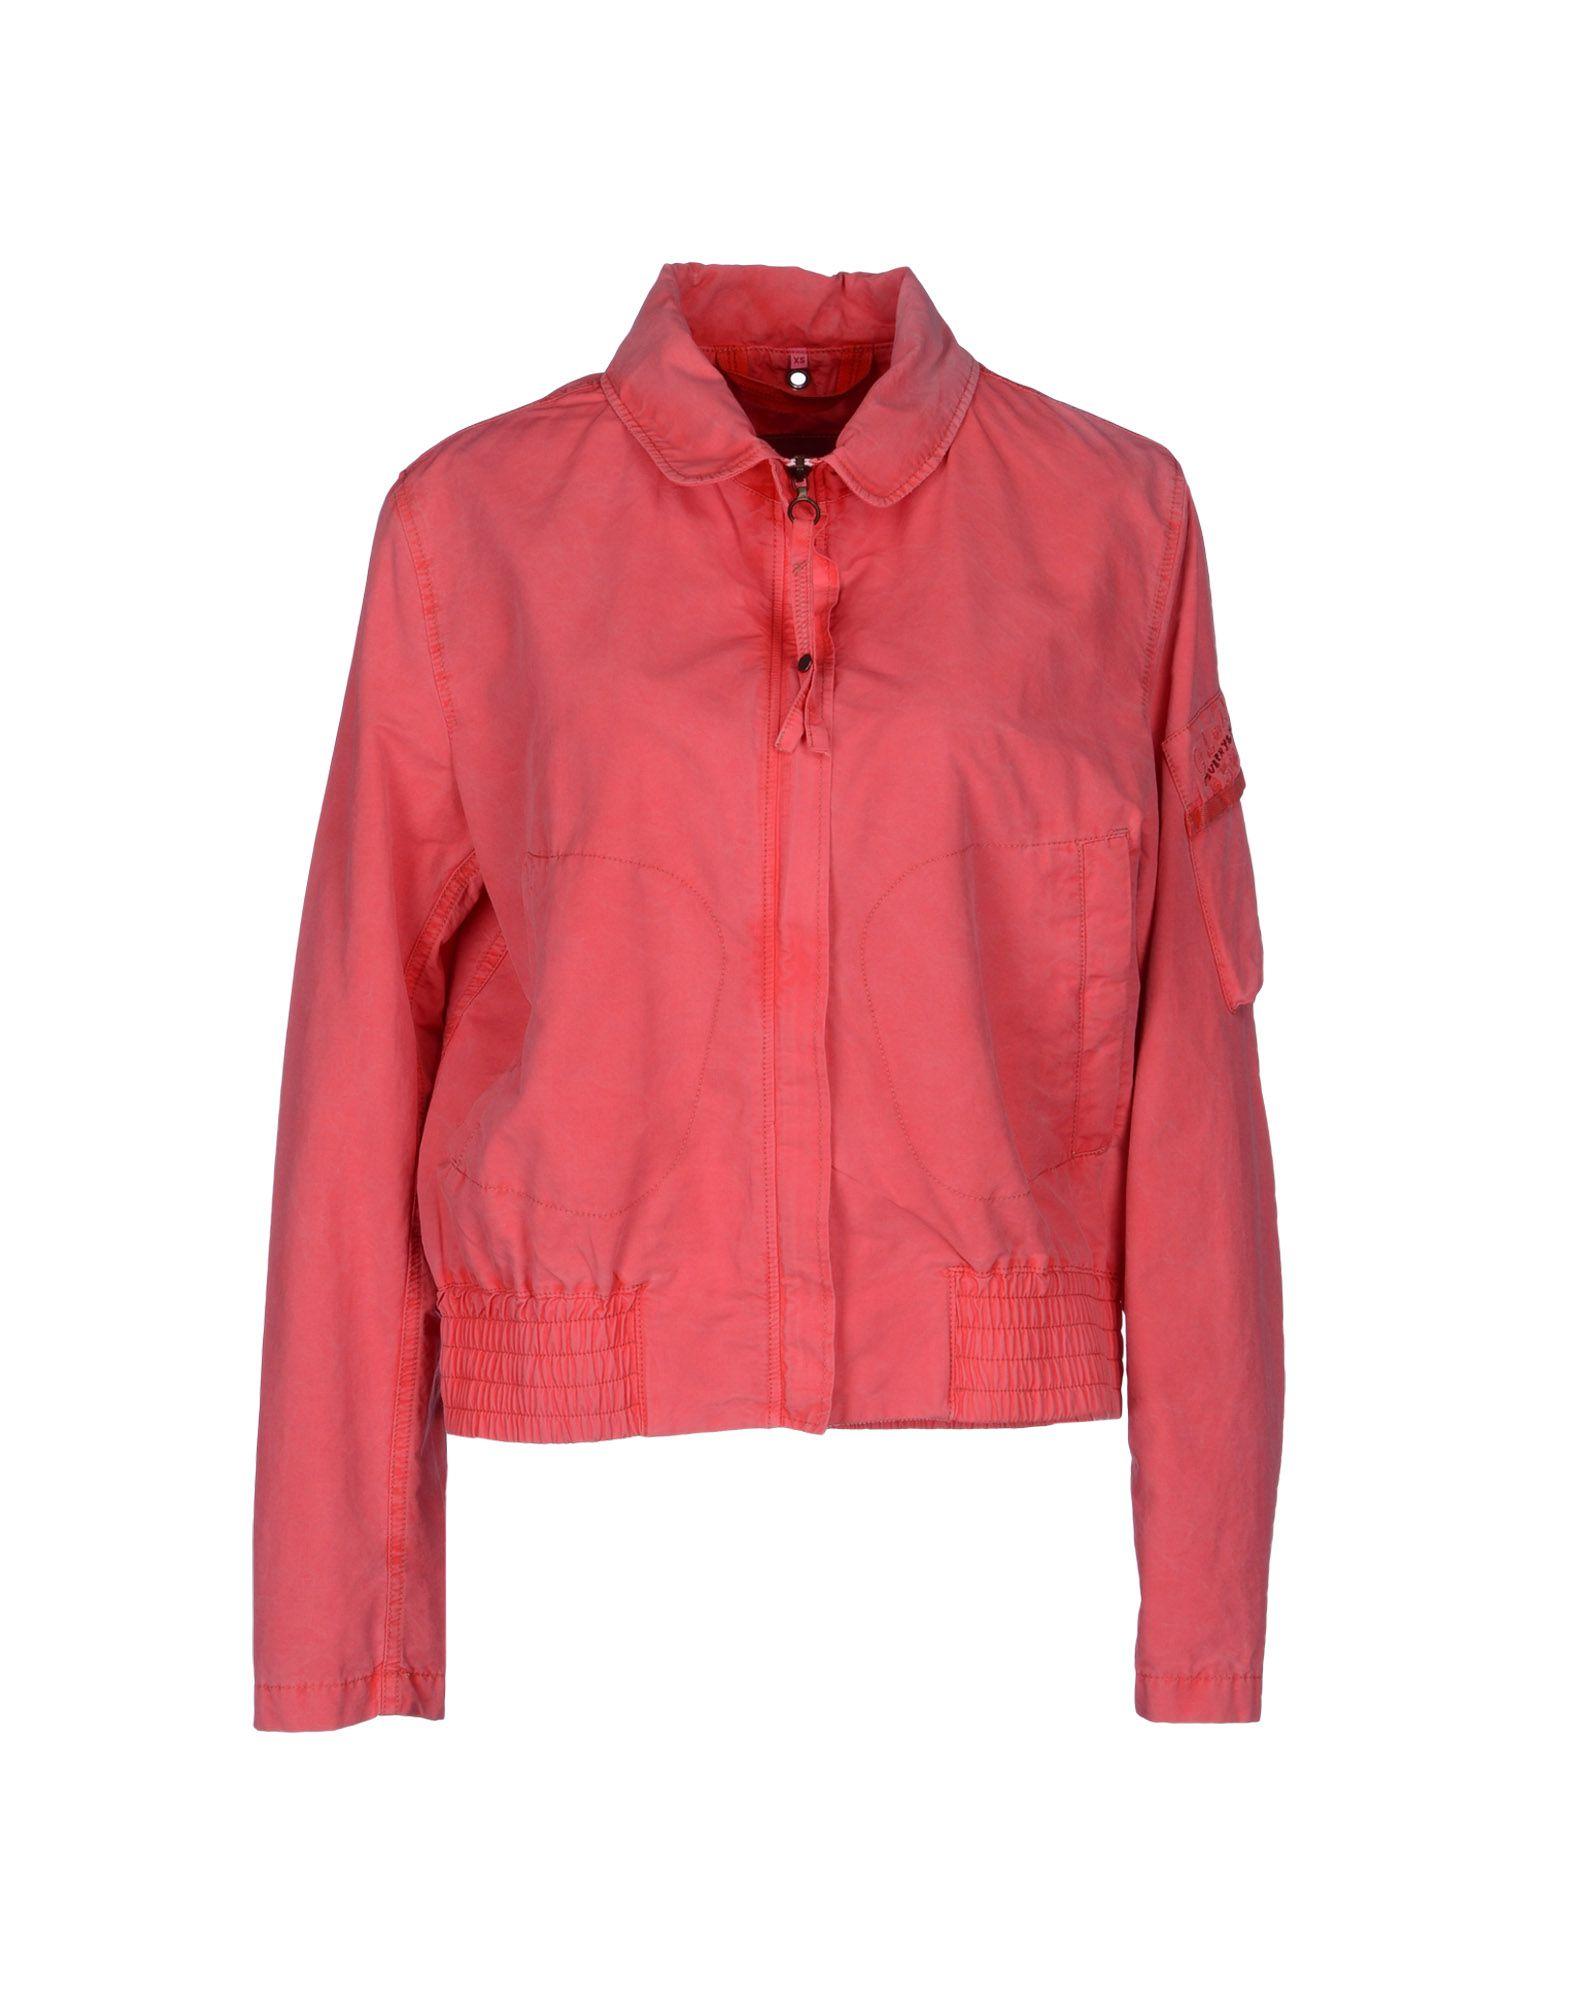 murphy nye jacket in red coral lyst. Black Bedroom Furniture Sets. Home Design Ideas